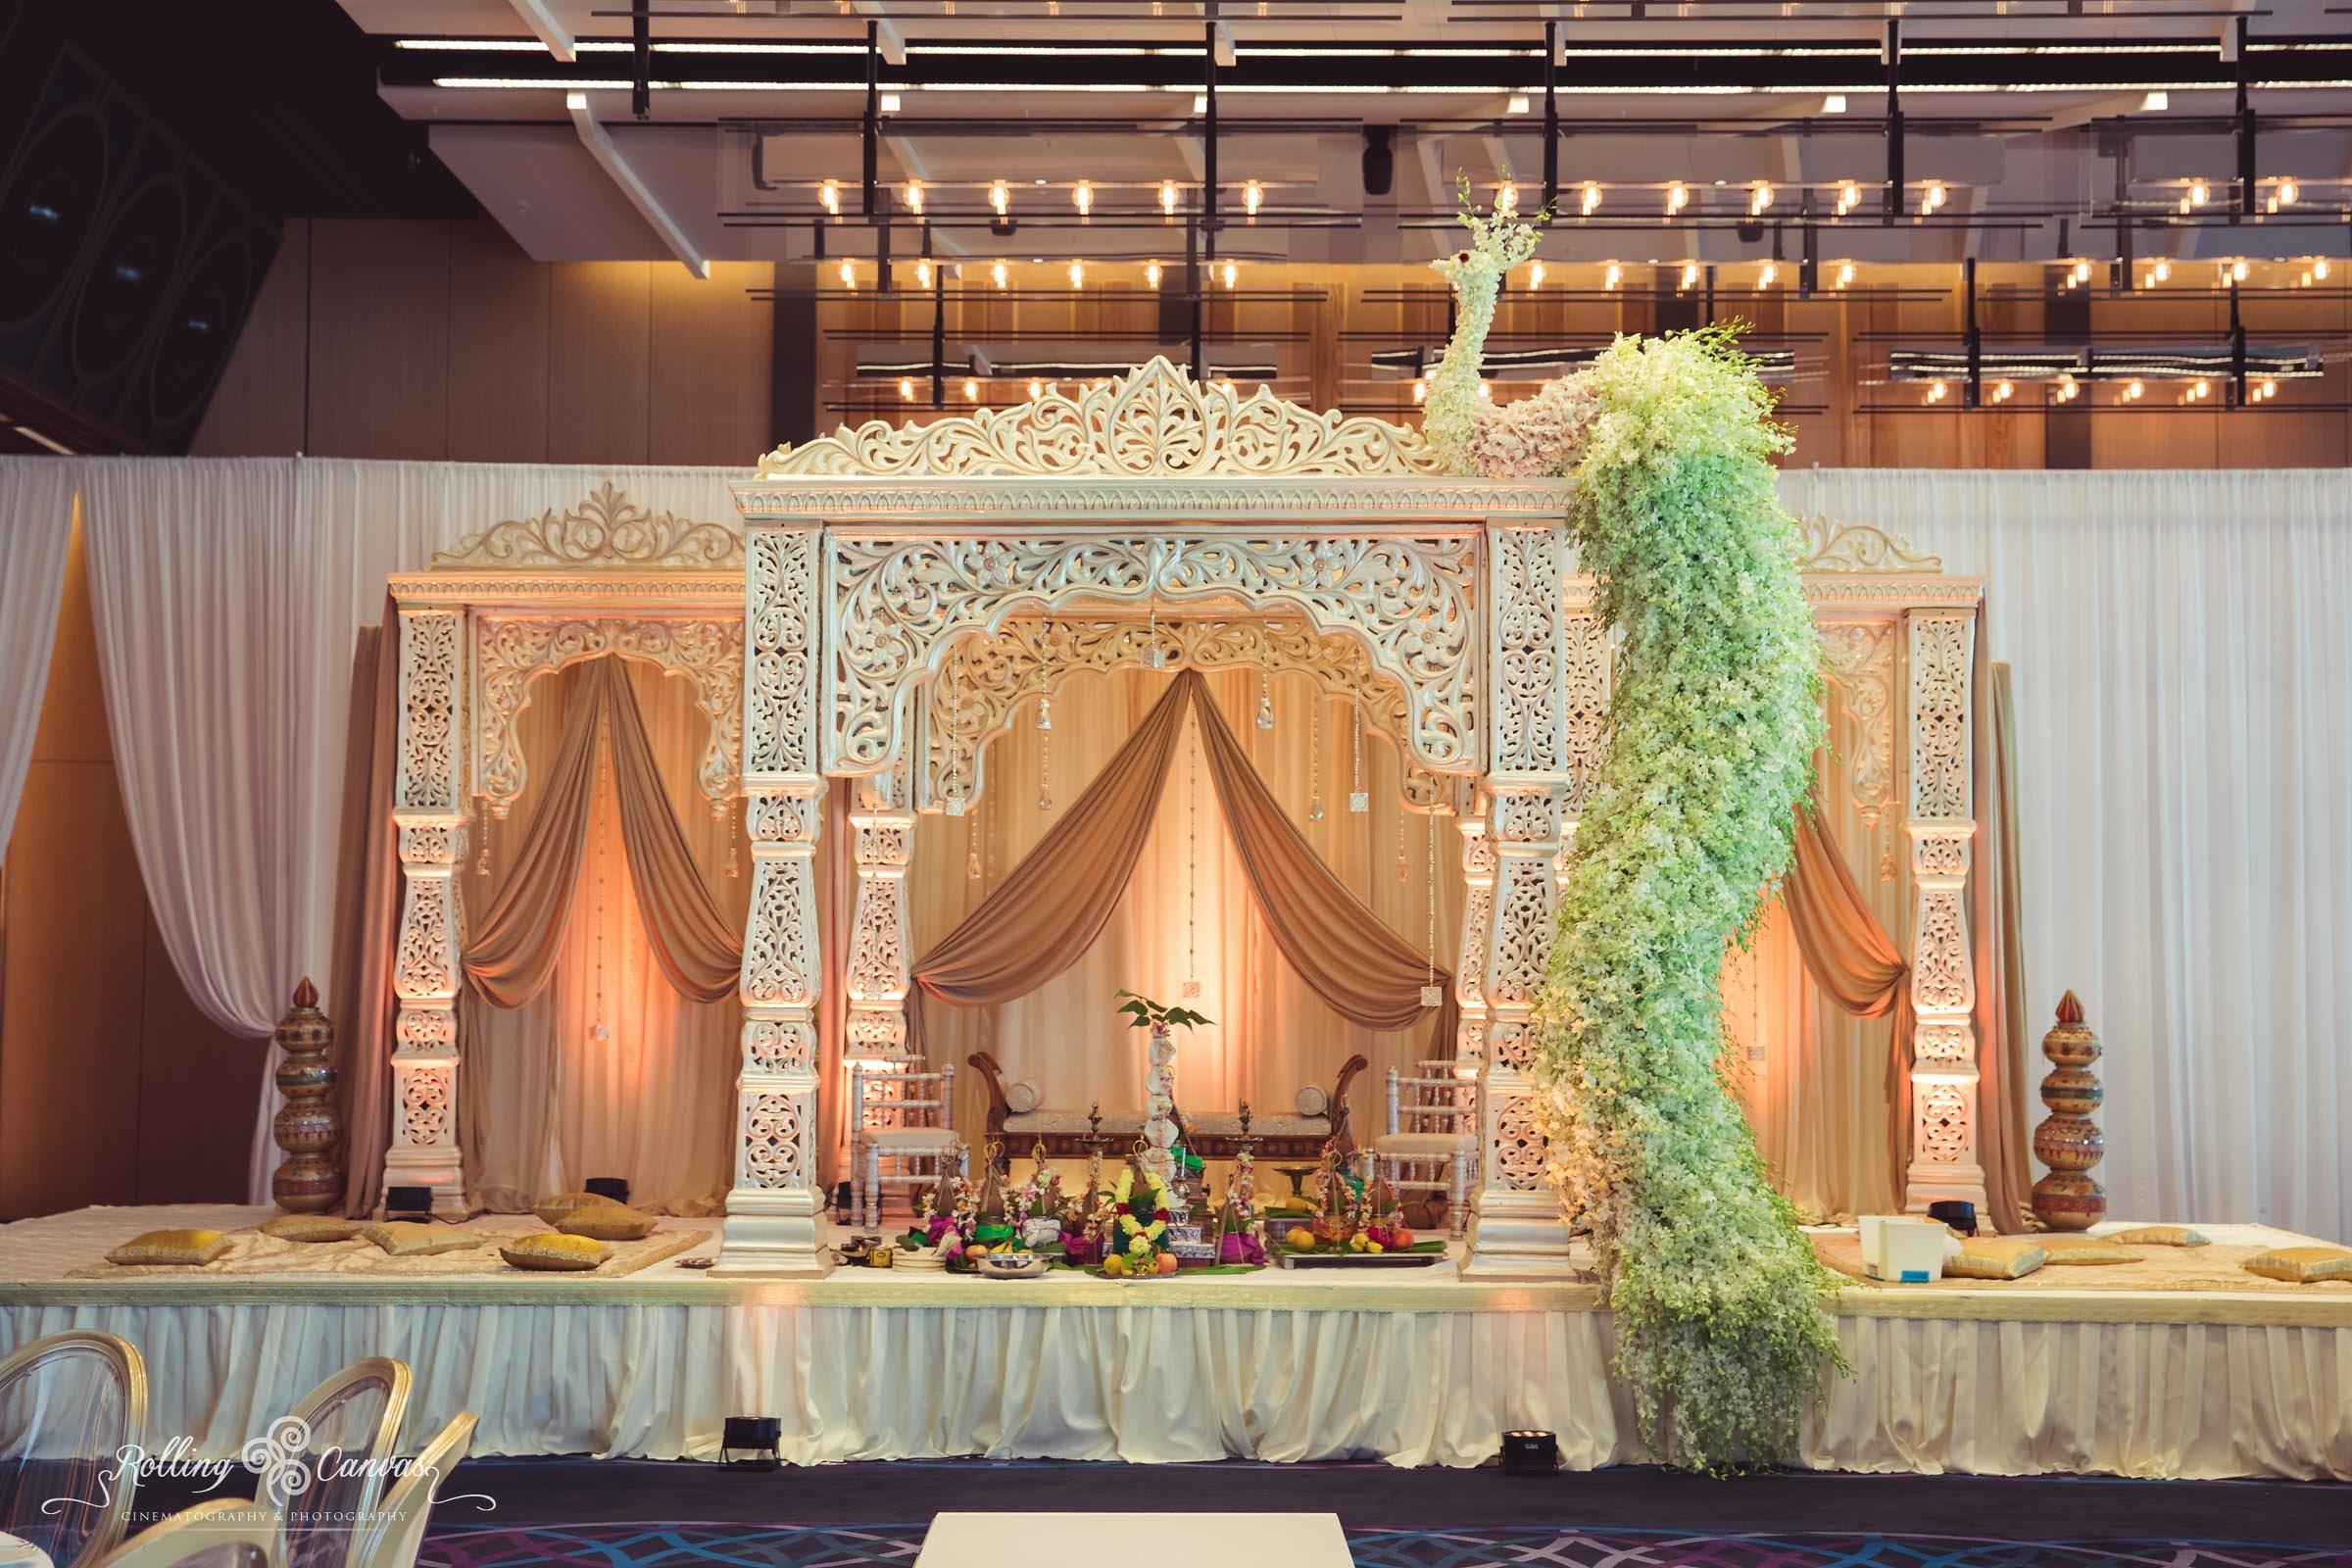 Wedding_Photography_Sydney_Rolling_Canvas_Presentation_Hindu_Ceremony_Mandap_Canopy_Decor_Floral_Design_Hyatt_Regency-57065.jpg